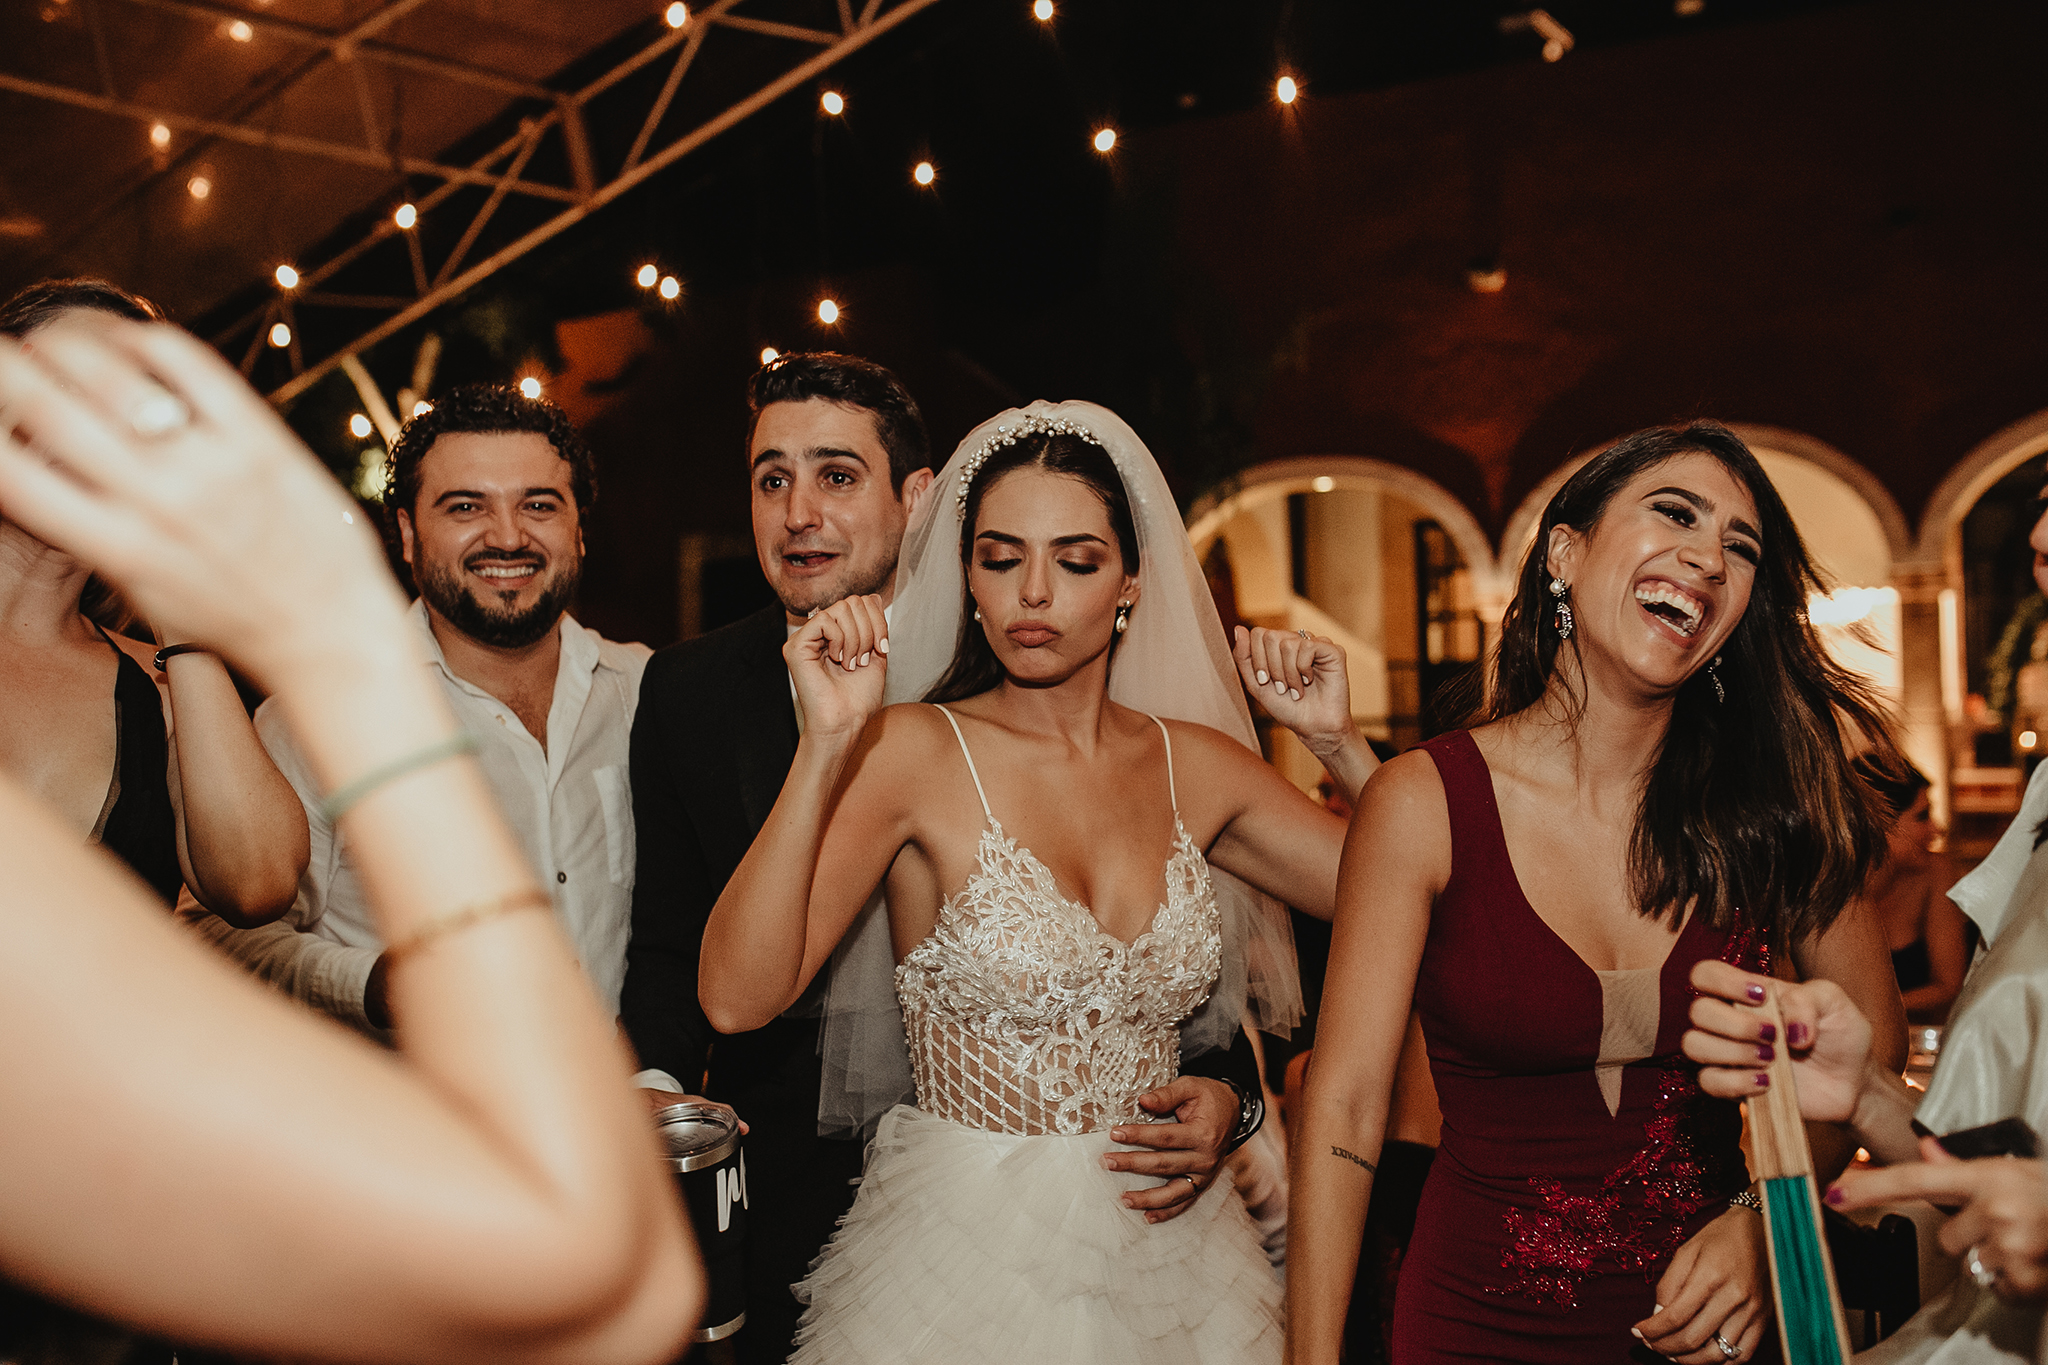 1008R&F__WeddingDestination_Weddingmerida_BodaMexico_FotografoDeBodas_FabrizioSimoneenFotografo.jpg